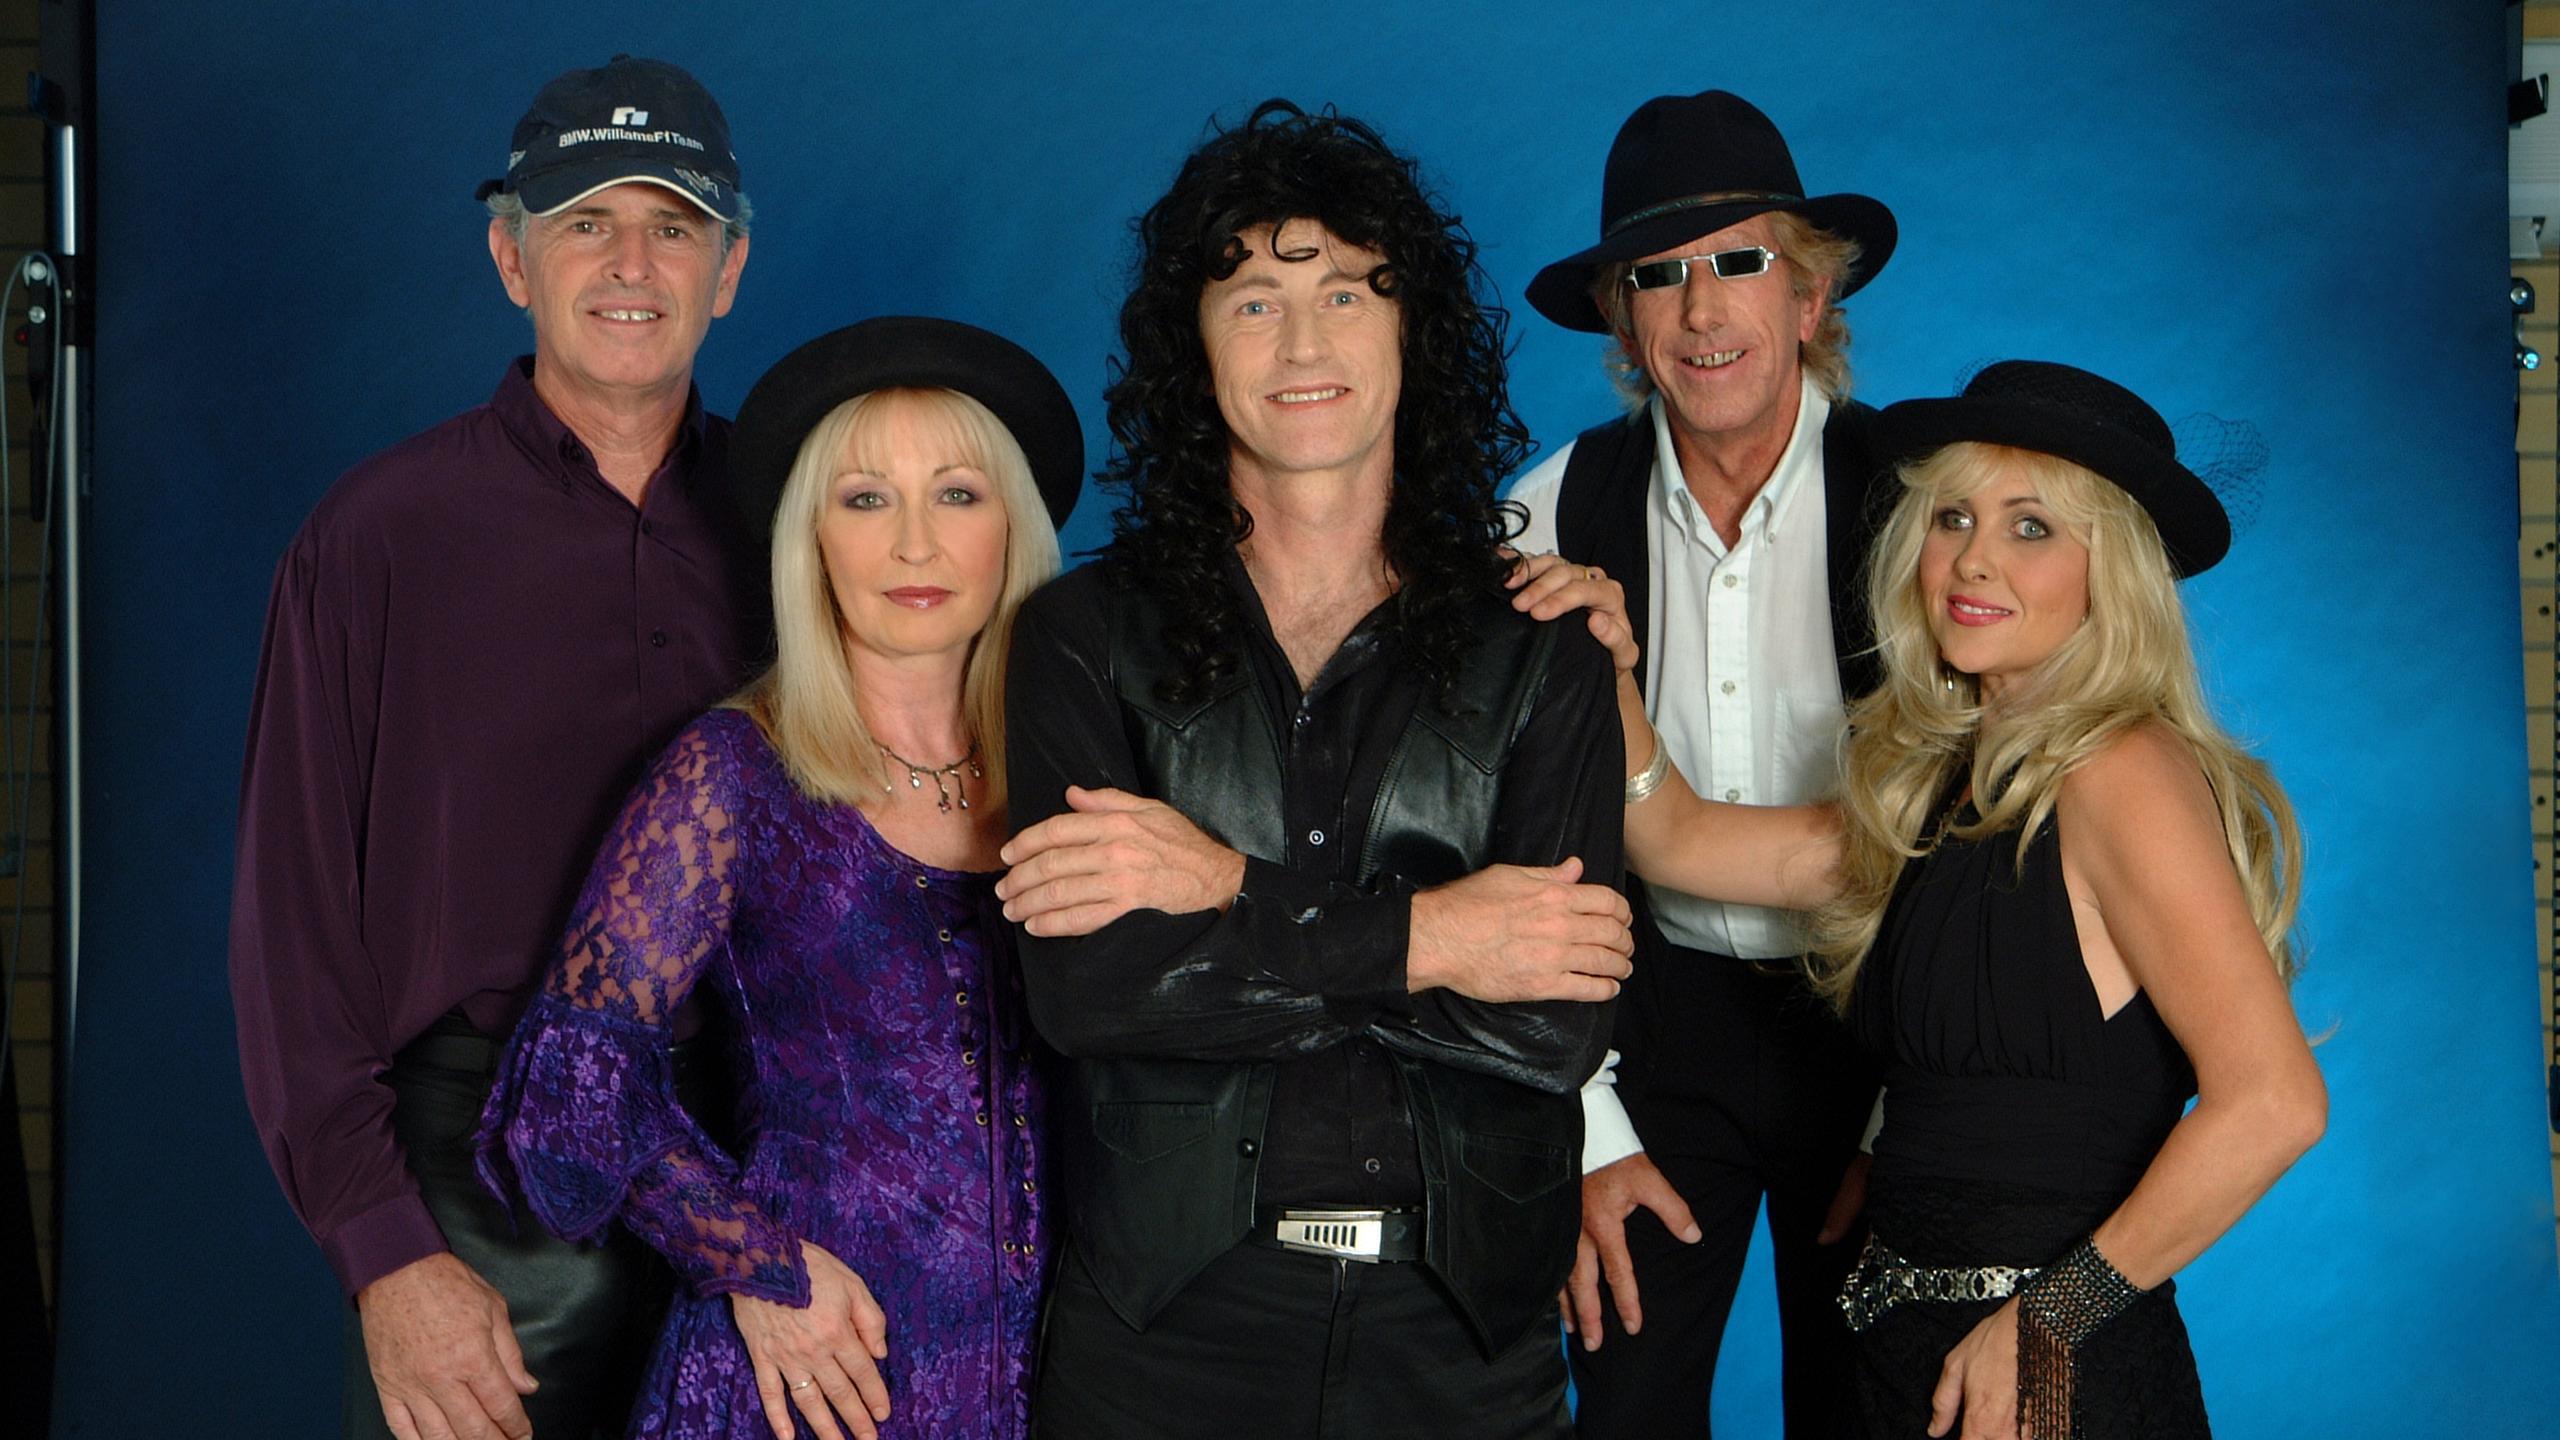 Fleetwood Mac Tour 2020 Rumours (Fleetwood Mac Tribute) tour dates 2019 2020. Rumours